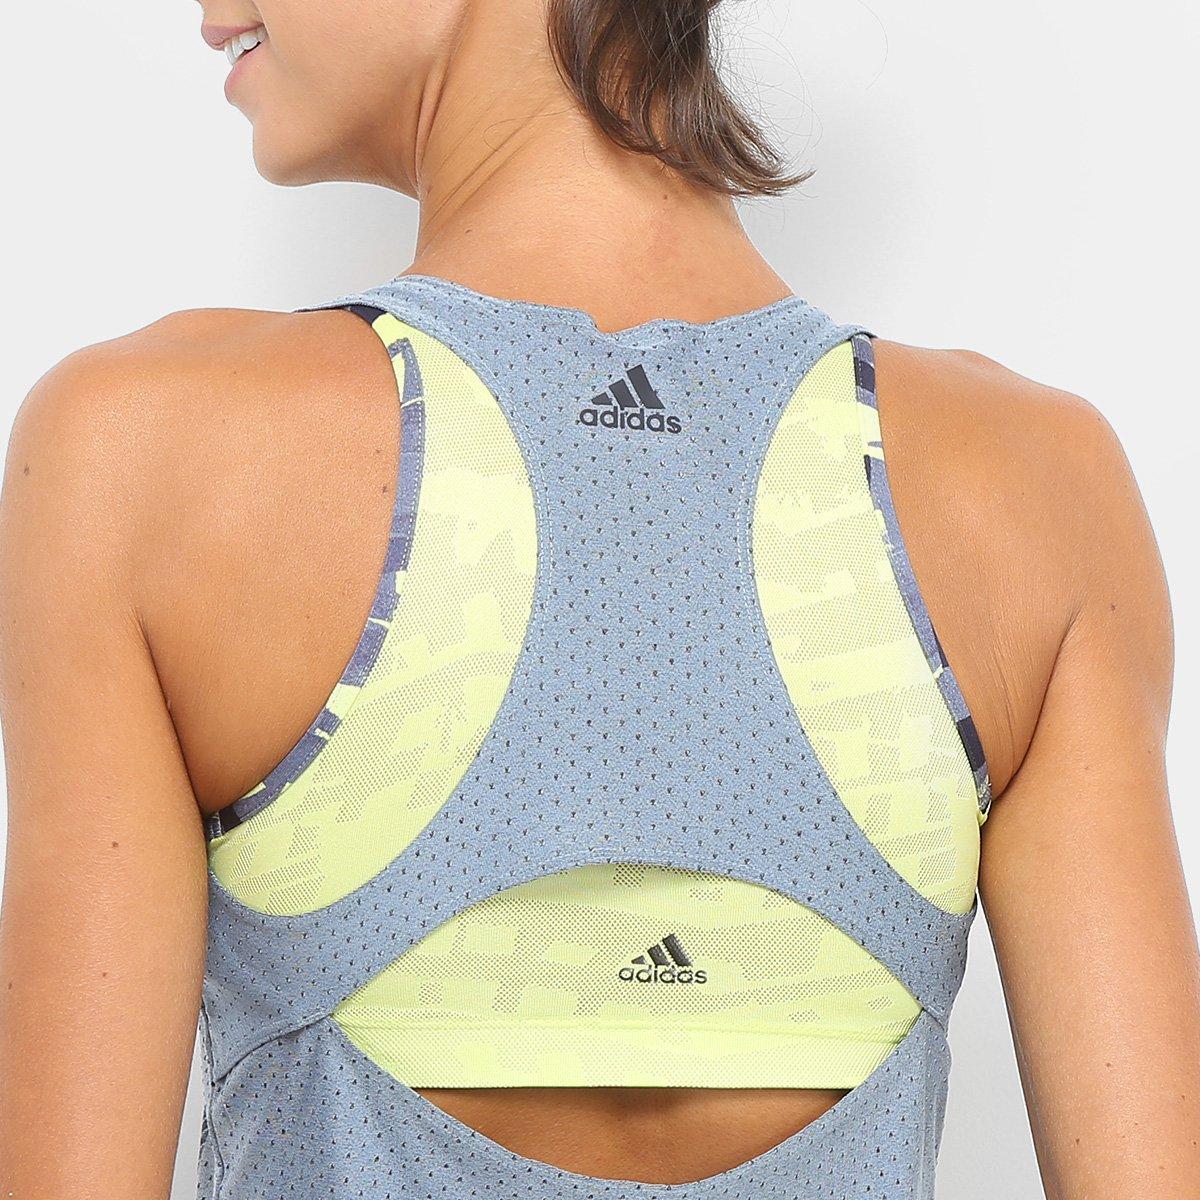 Feminina Regata Adidas Cinza Jacquard Regata Adidas IxTBRwY